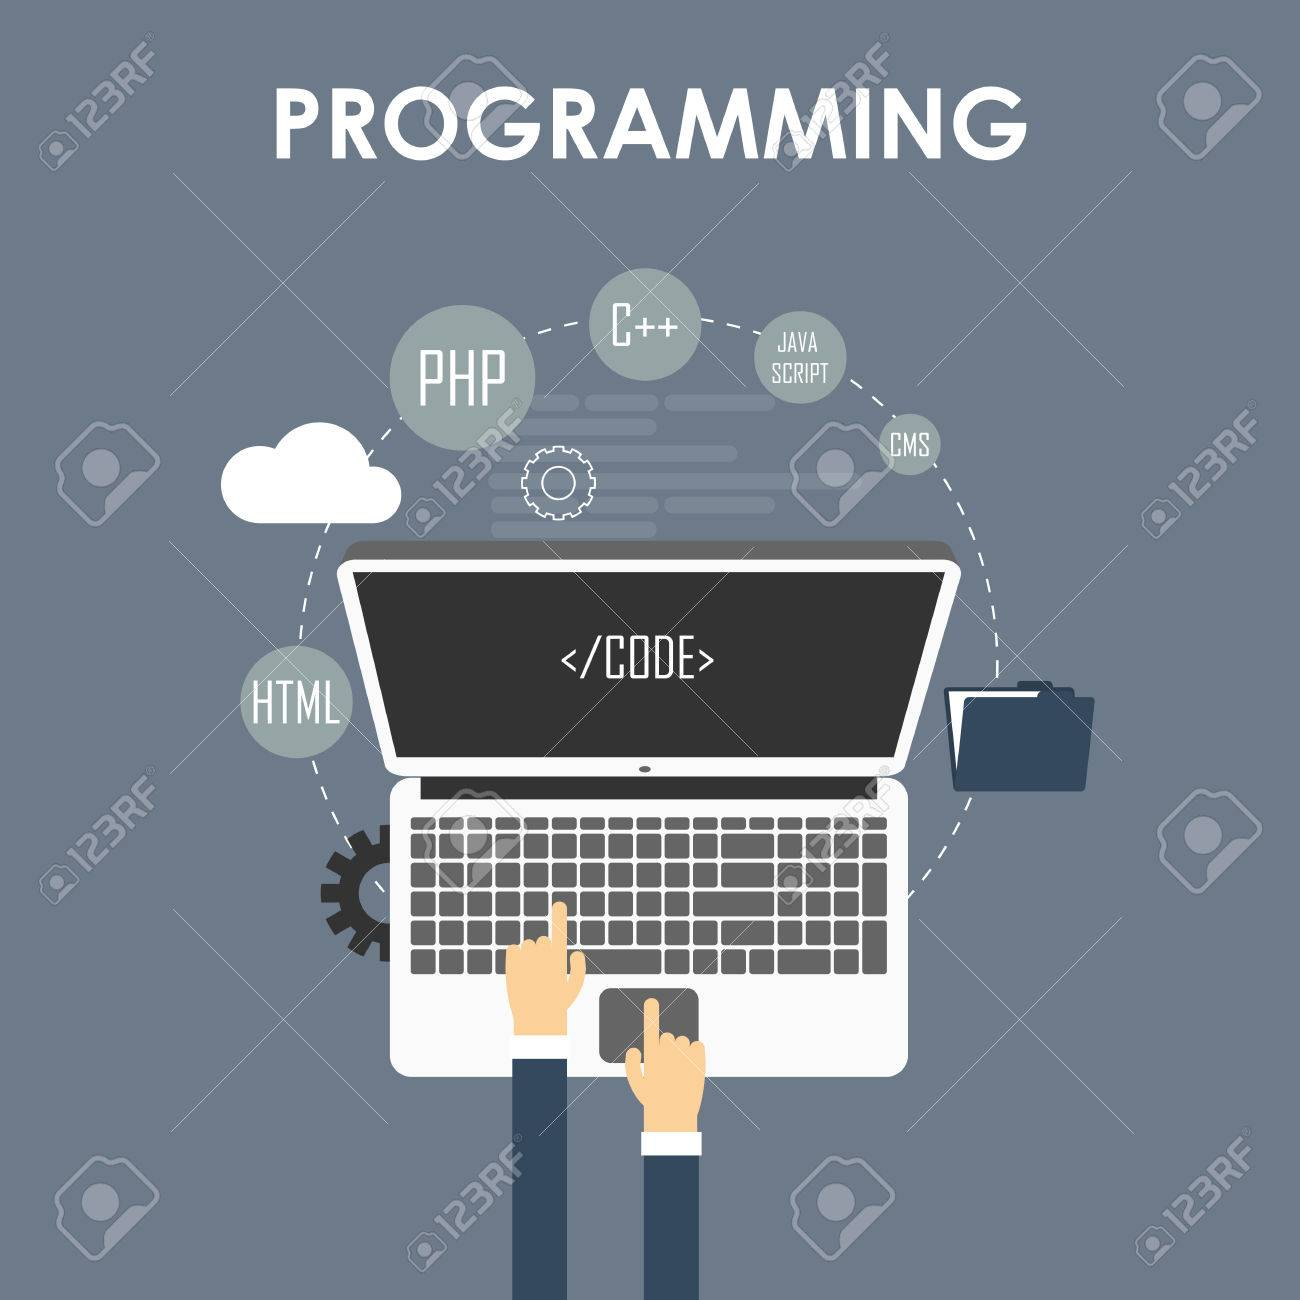 Programming and coding, website development, web design. Flat vector illustration - 46995942